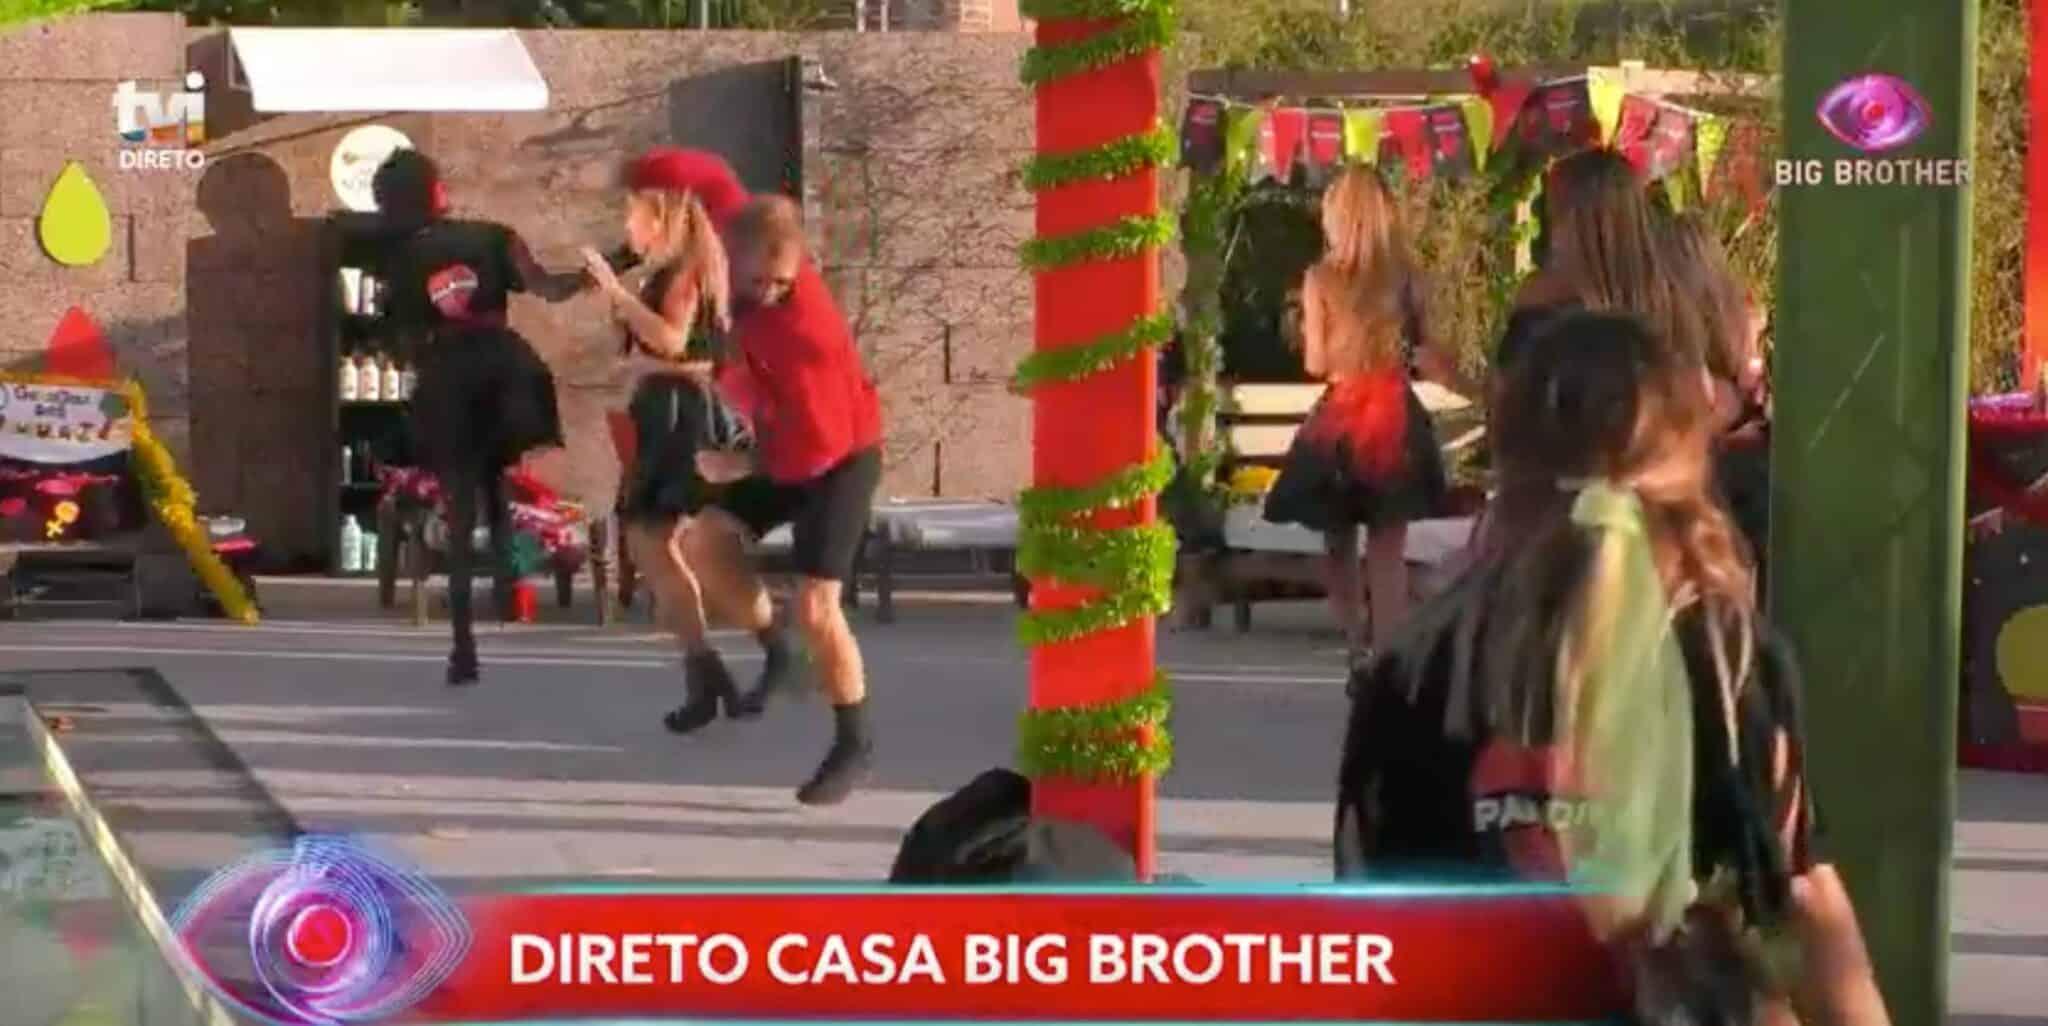 Big-Brother-Festa-2